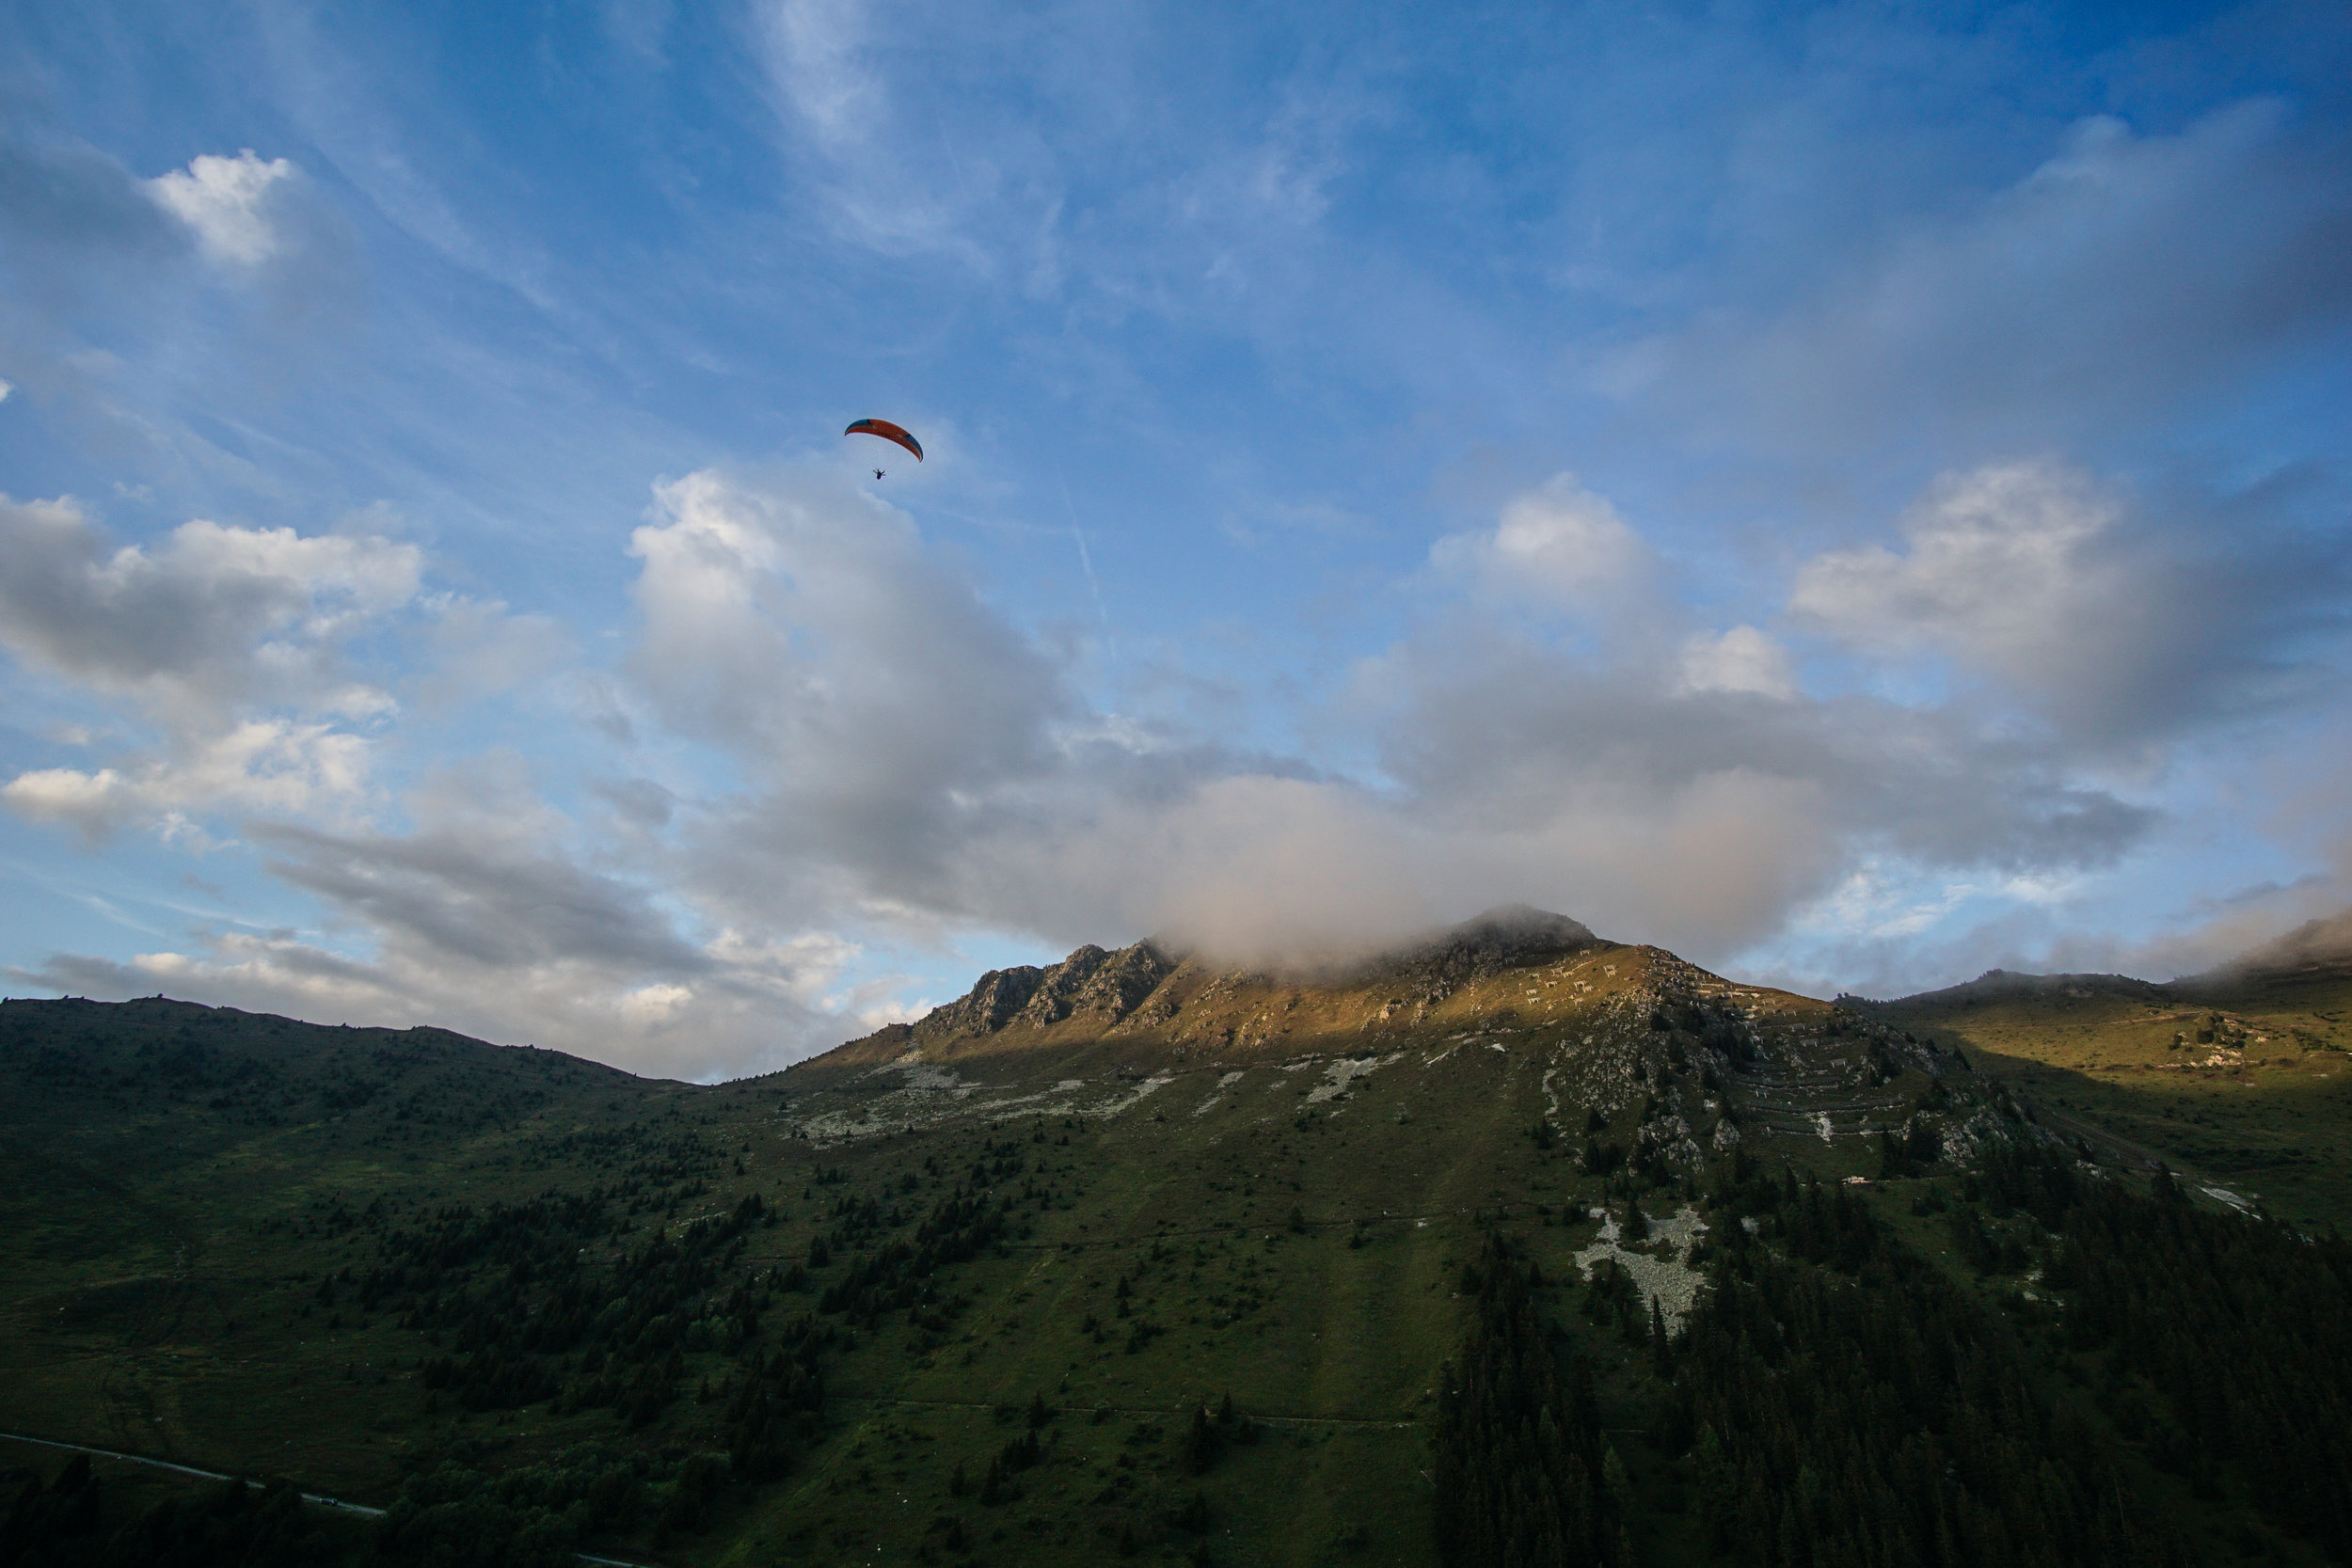 Becky flying over Verbier